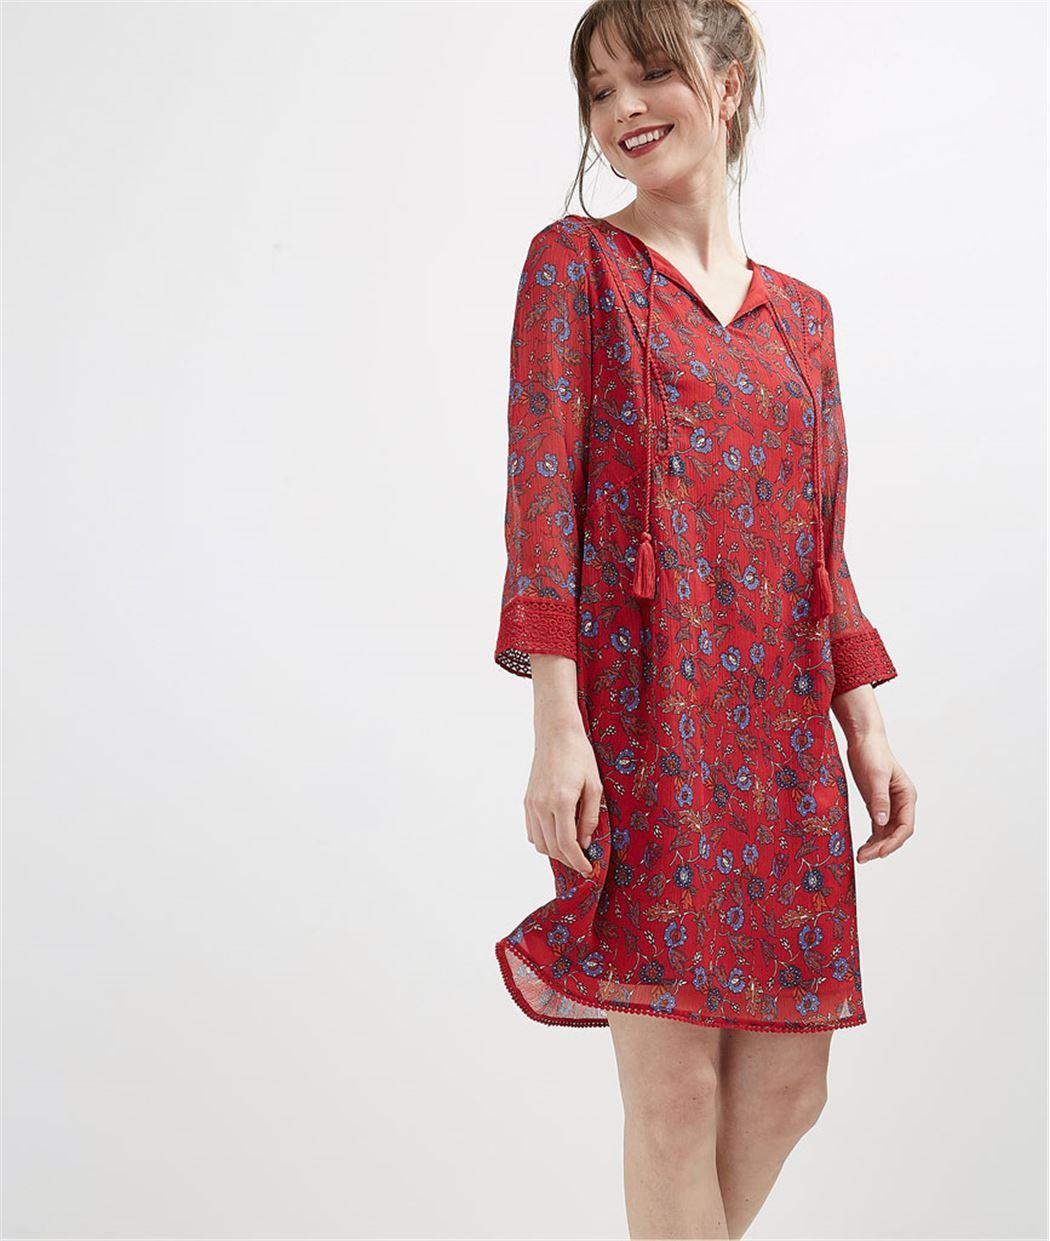 Robe femme imprimée avec pompons ROUGE